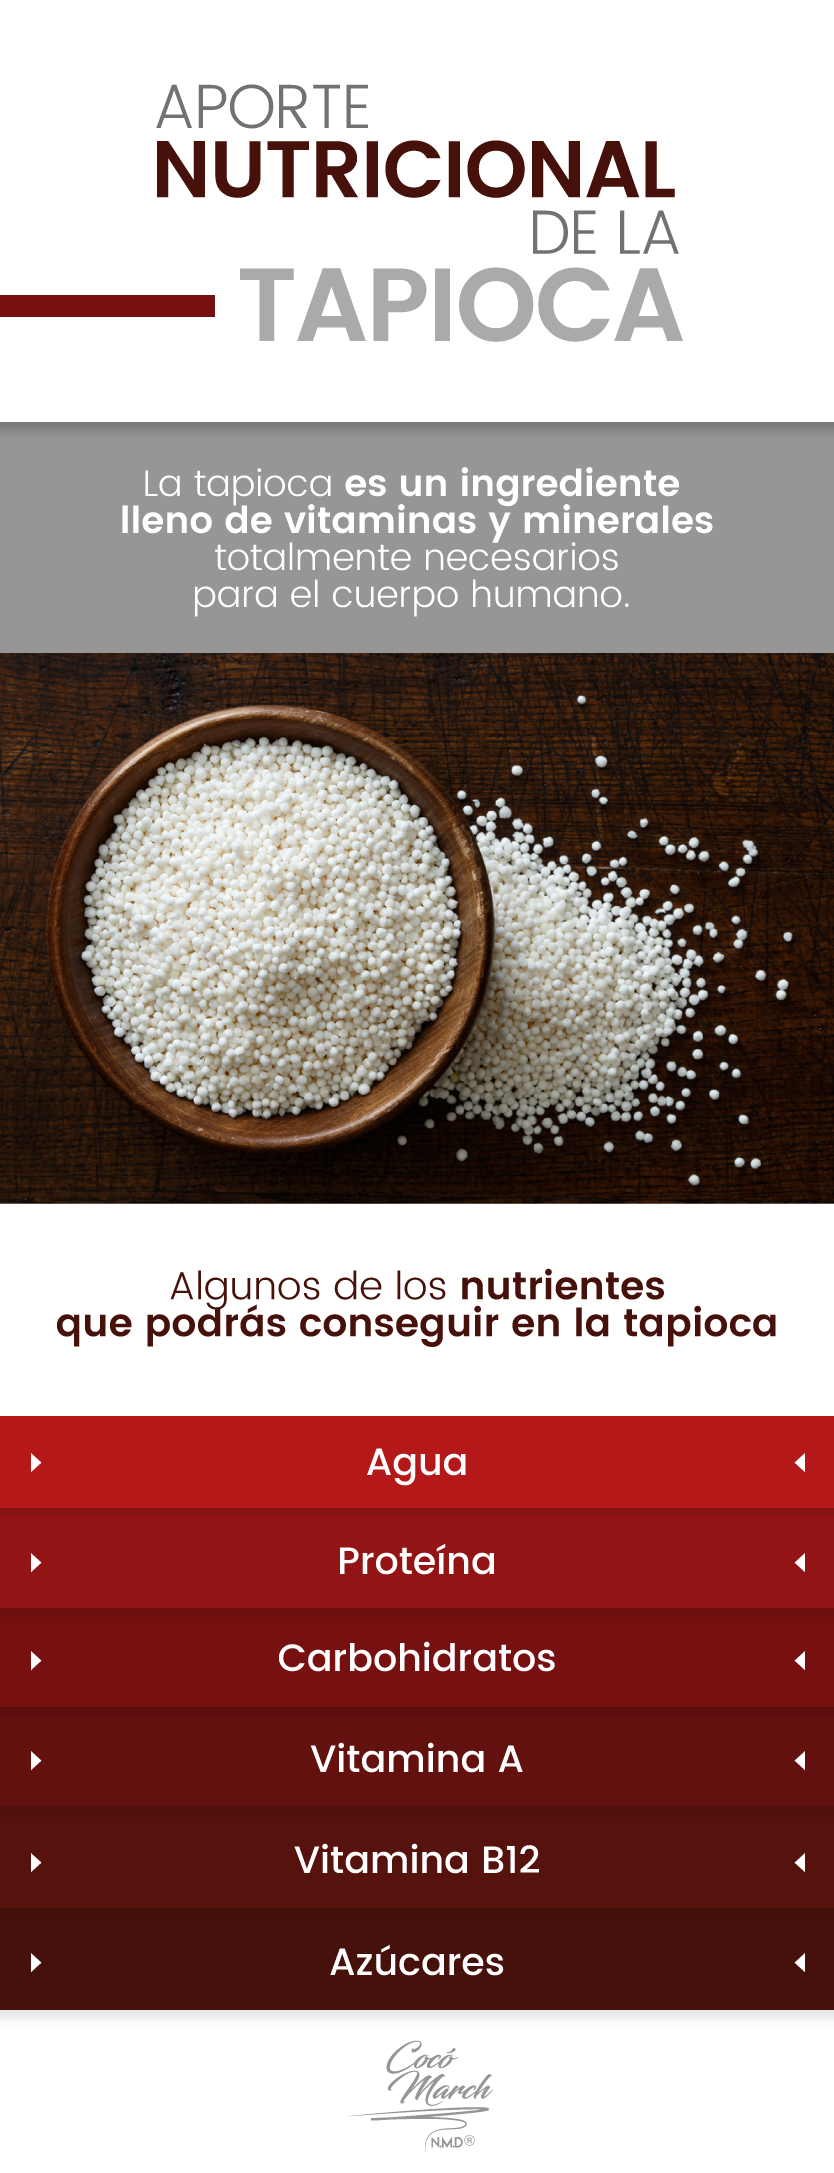 tapioca-aporte-nutricional